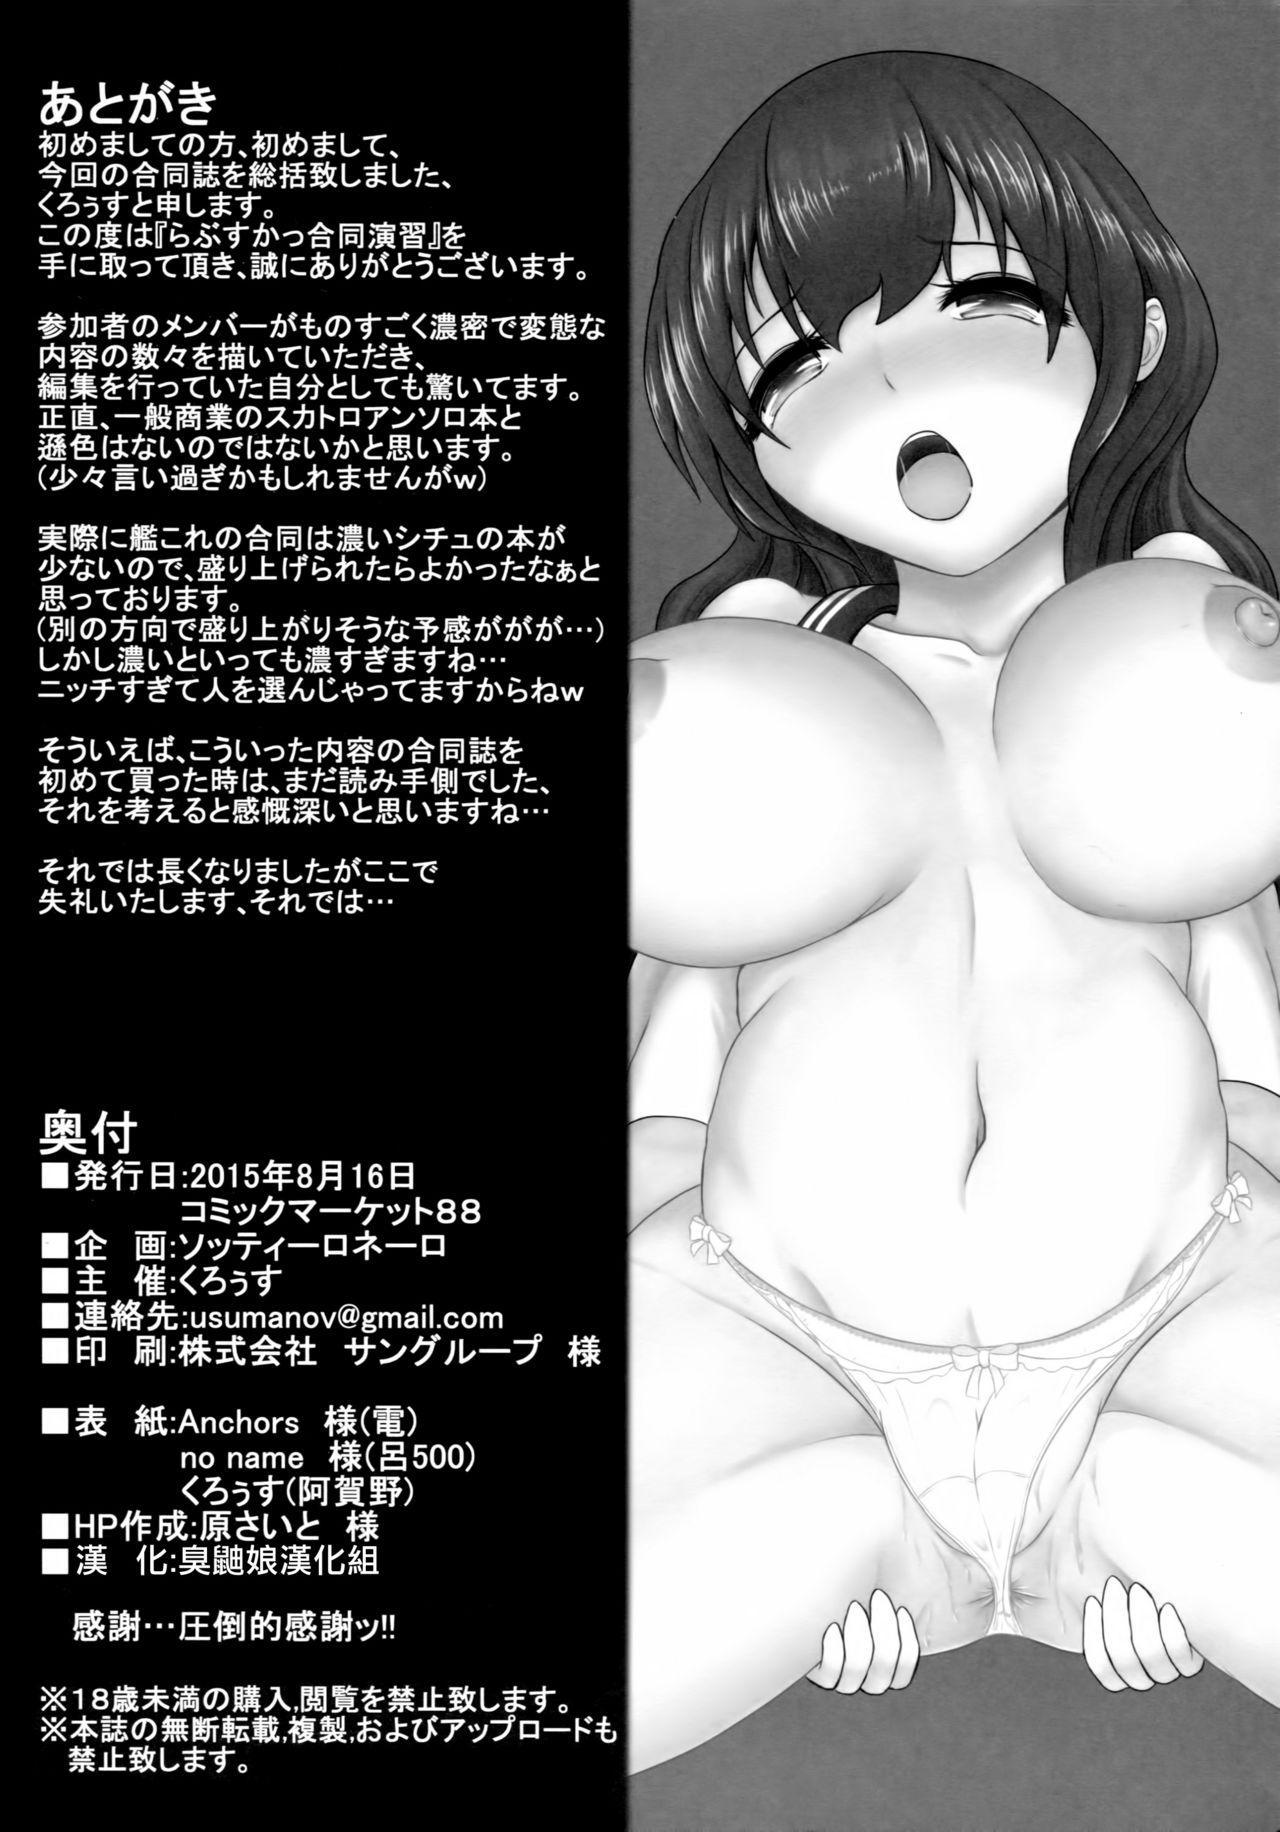 KanColle Haisetsu Sex Goudoushi LoveSca! Goudou Enshuu!! | 艦C排泄性交合同誌 激情糞便! 聯合演習!! 101